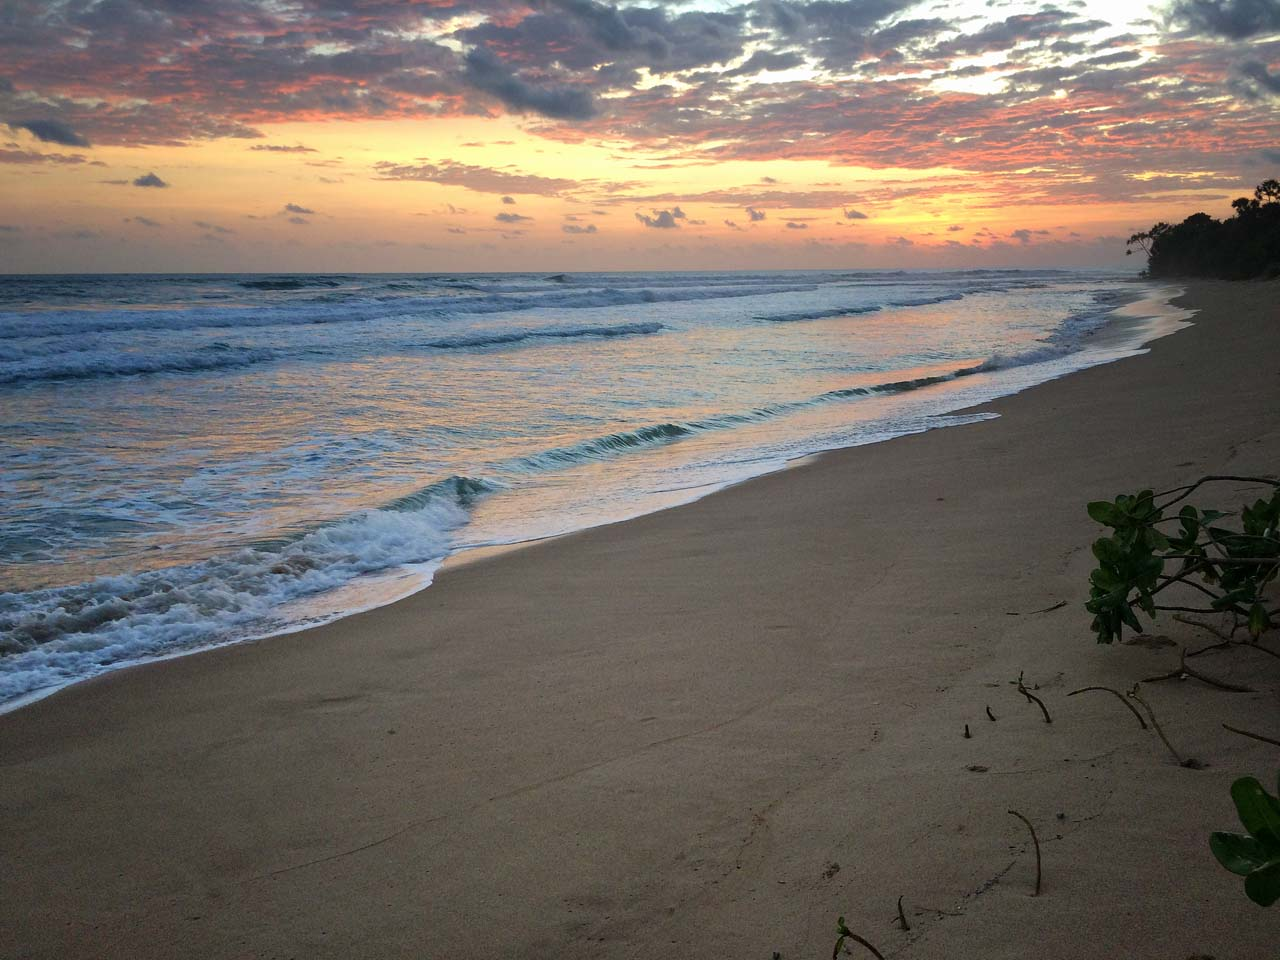 pantai di pesisir barat